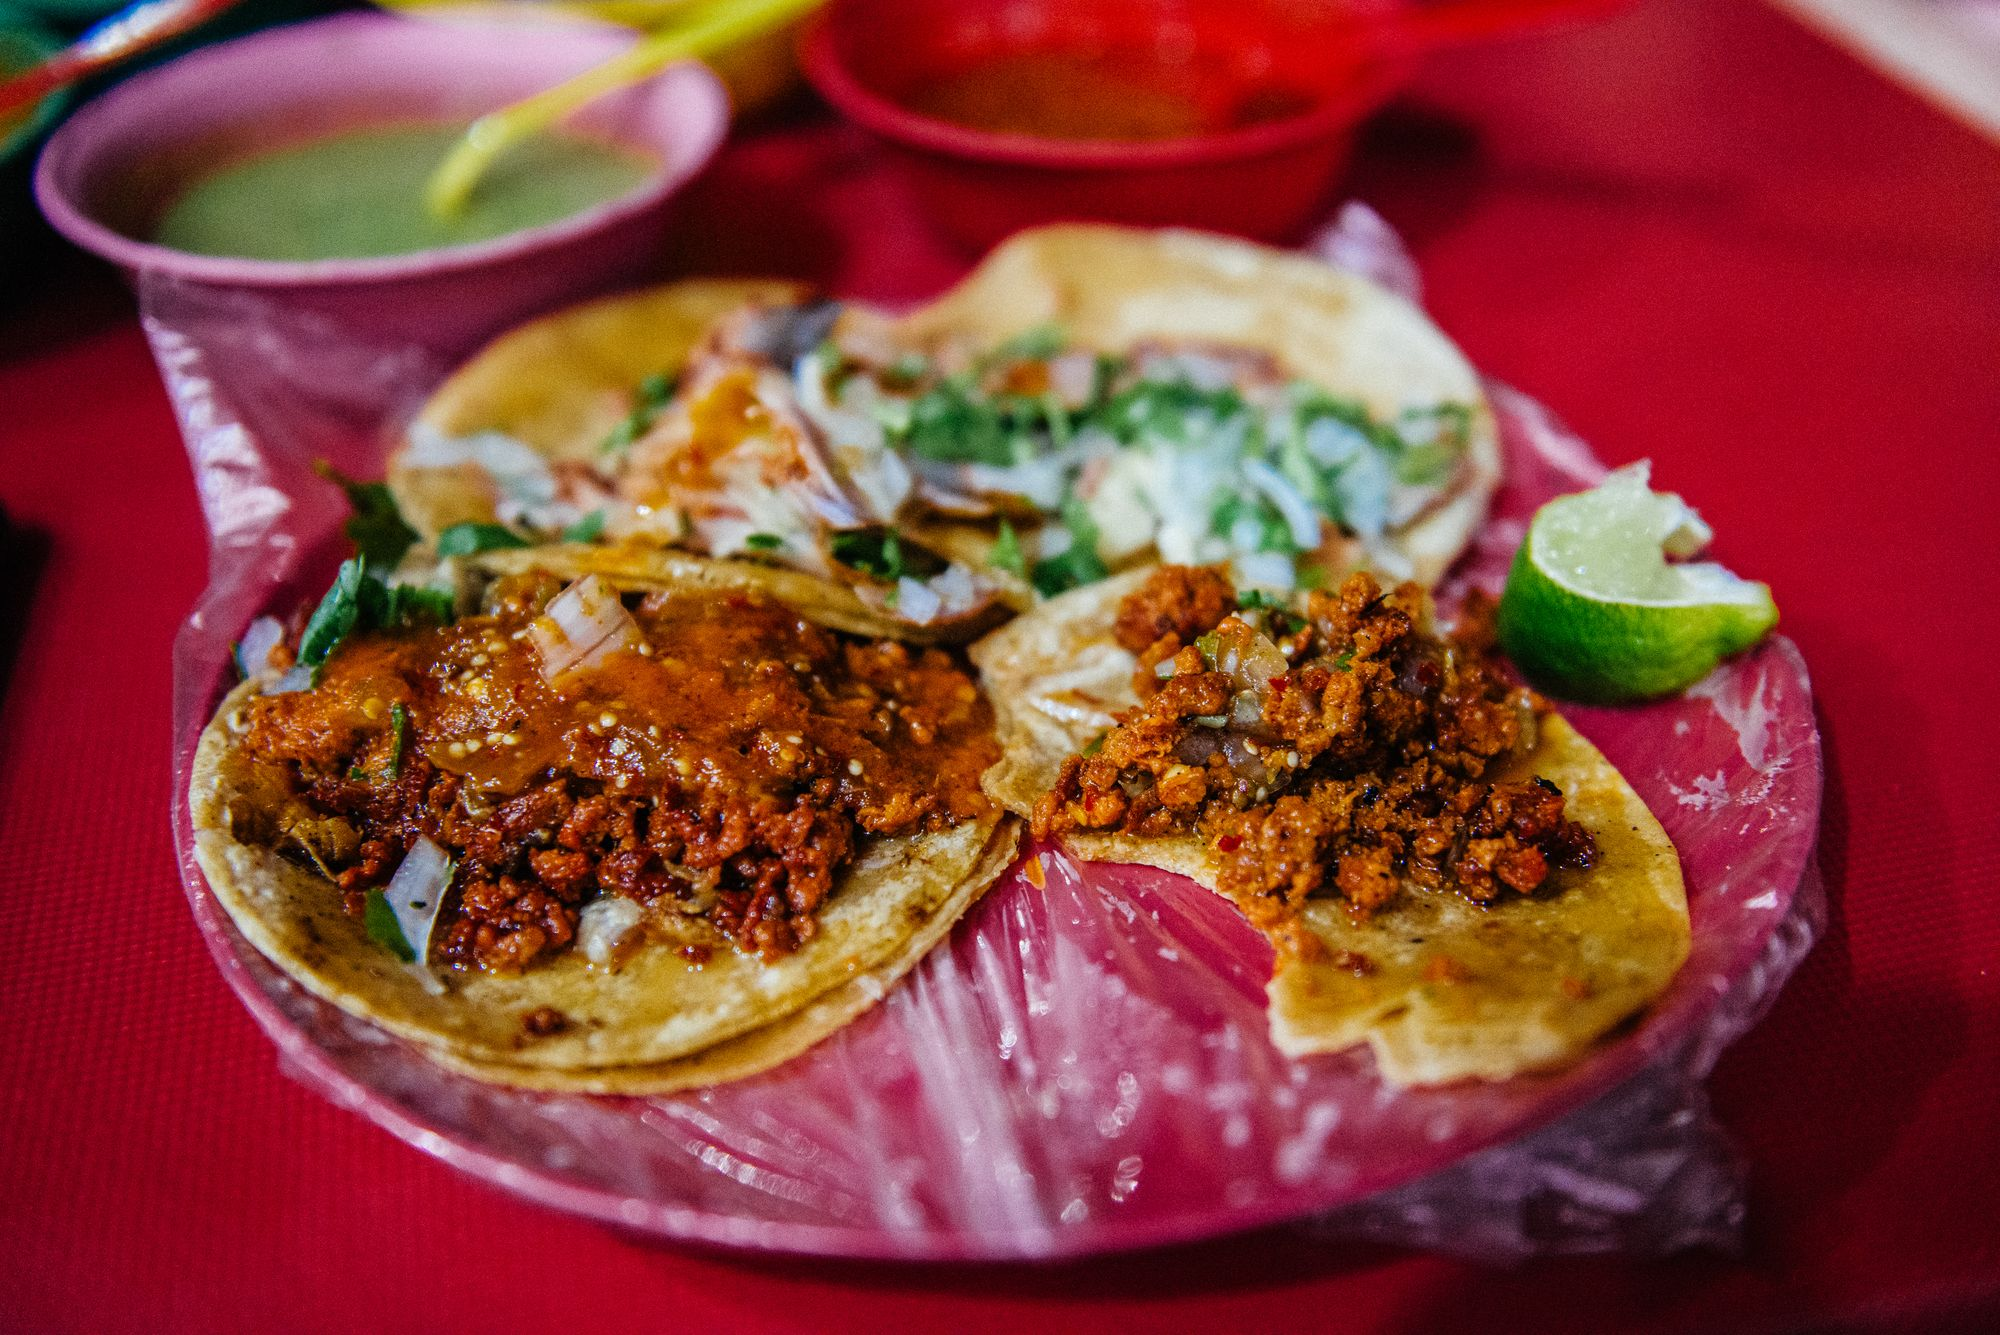 Photo of chorizo tacos.